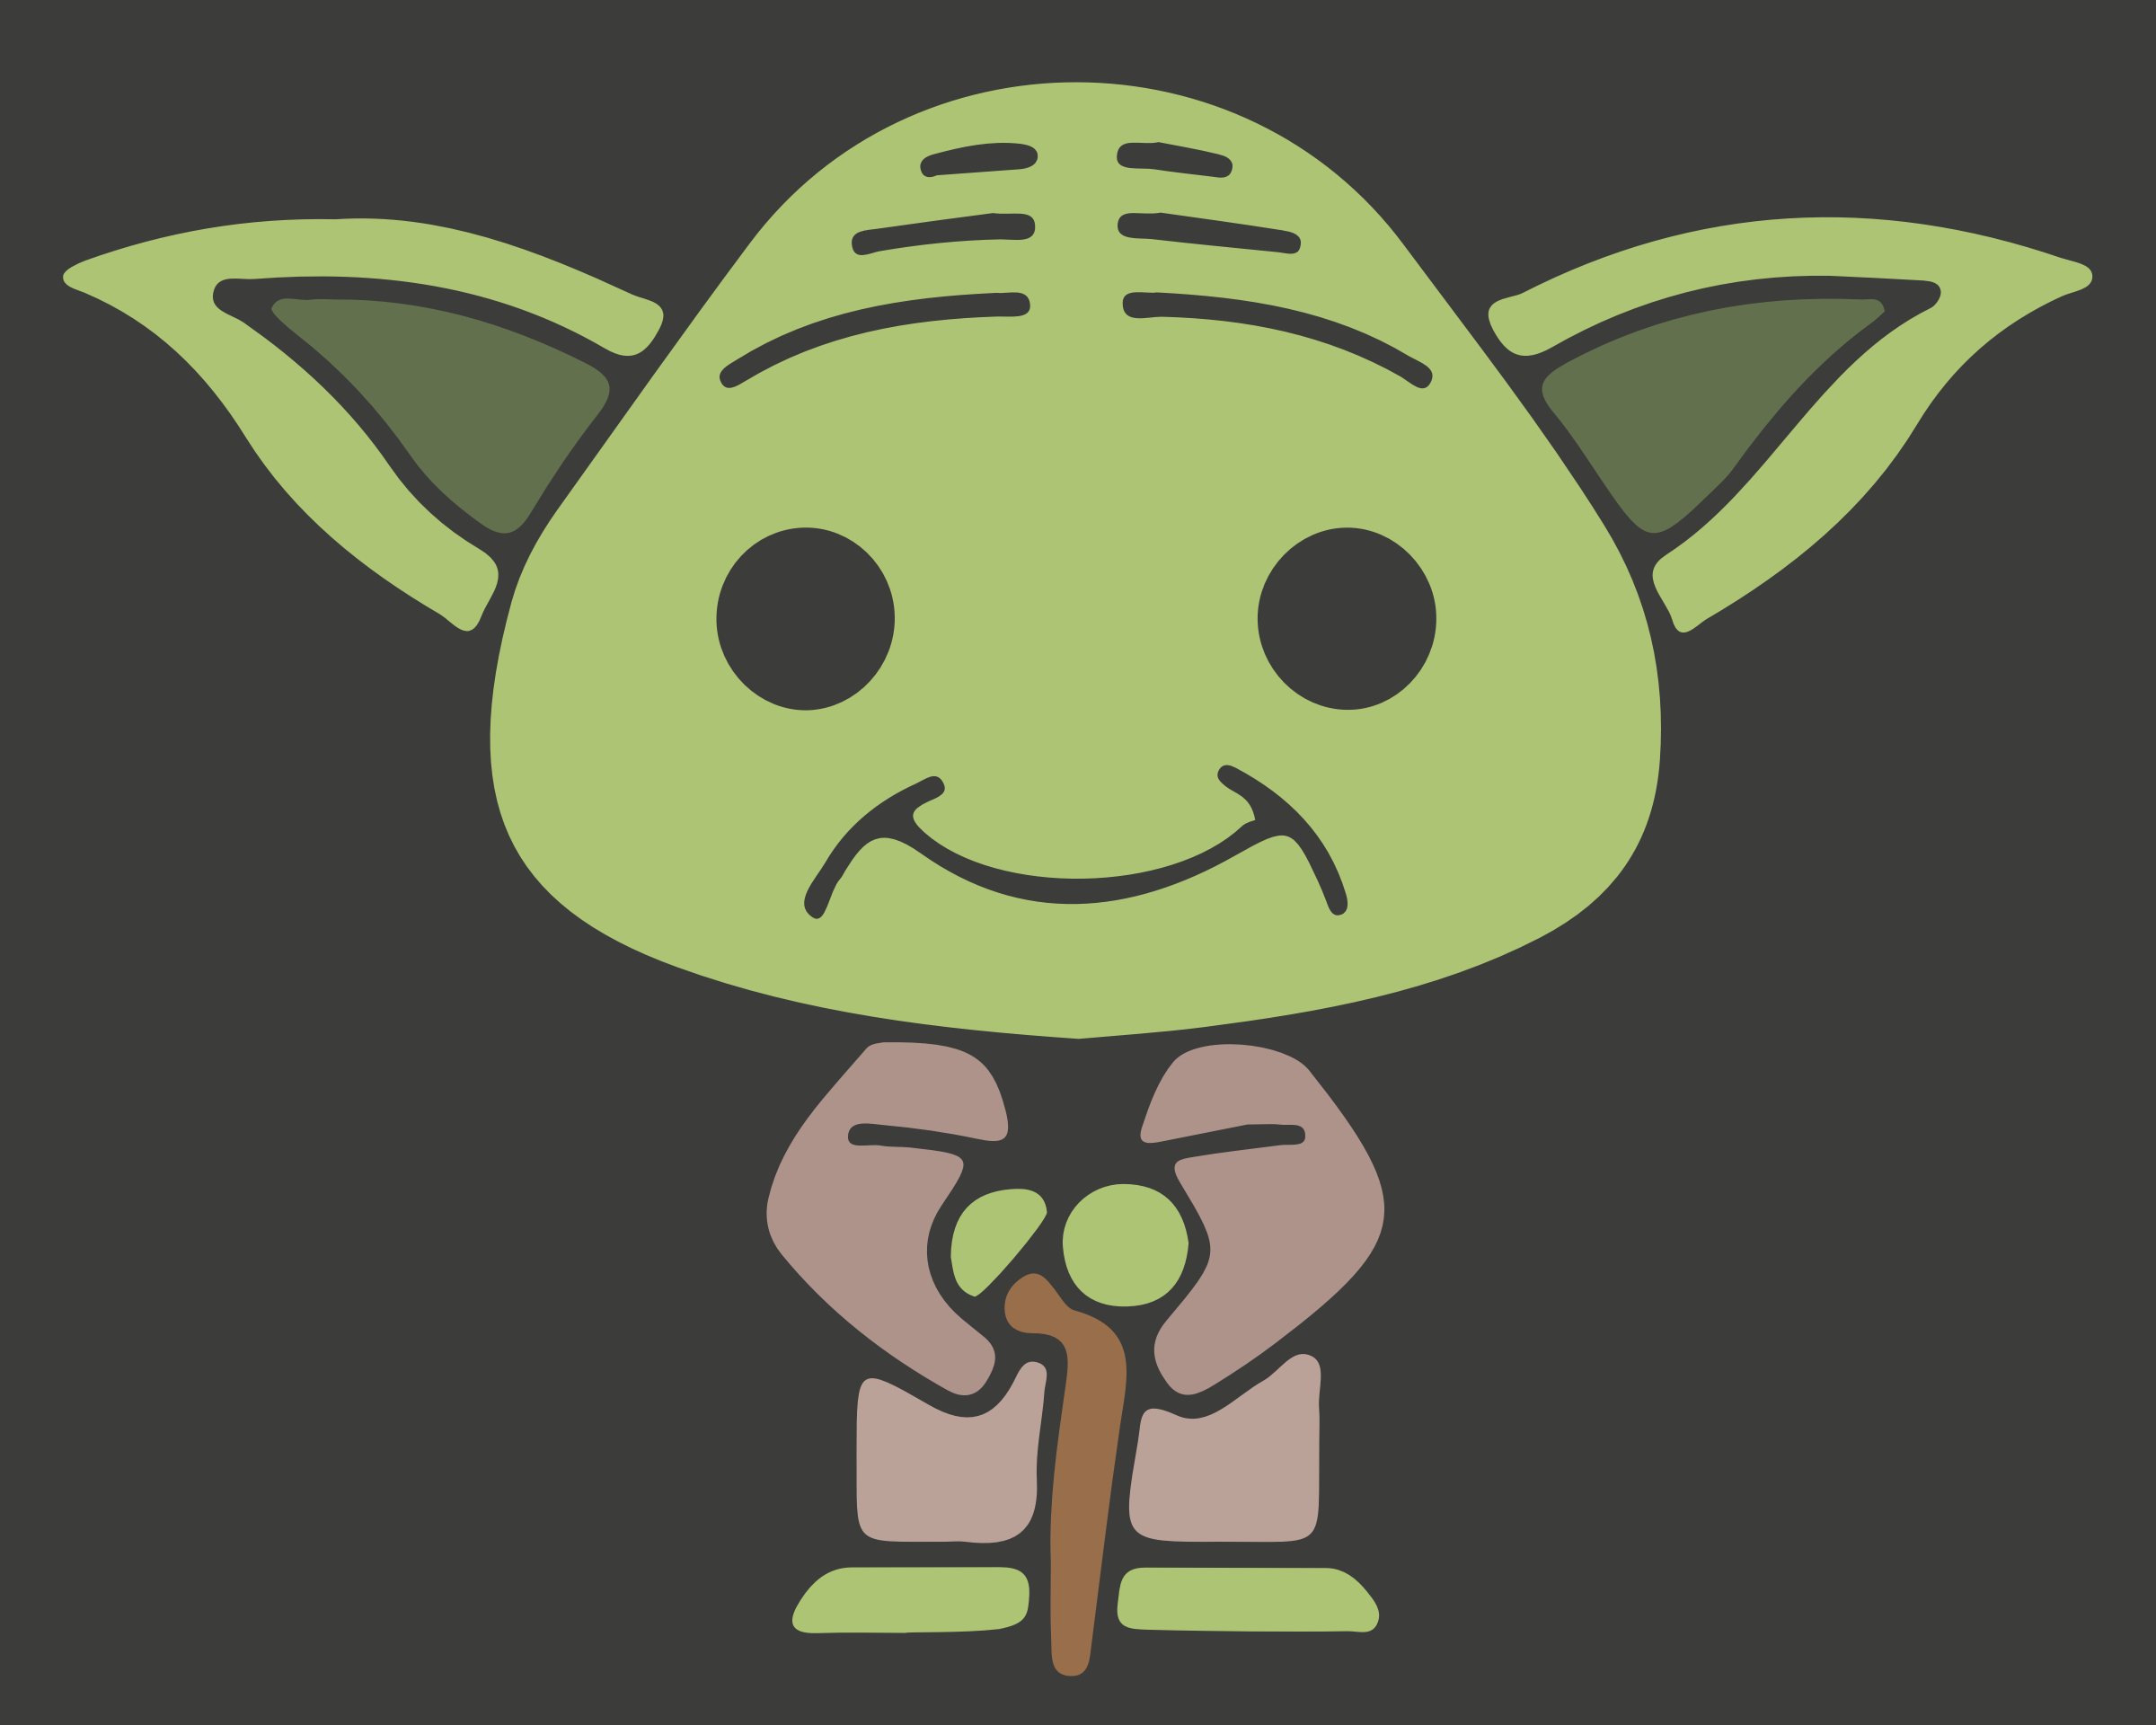 BIG IMAGE (PNG) - Cute Yoda PNG